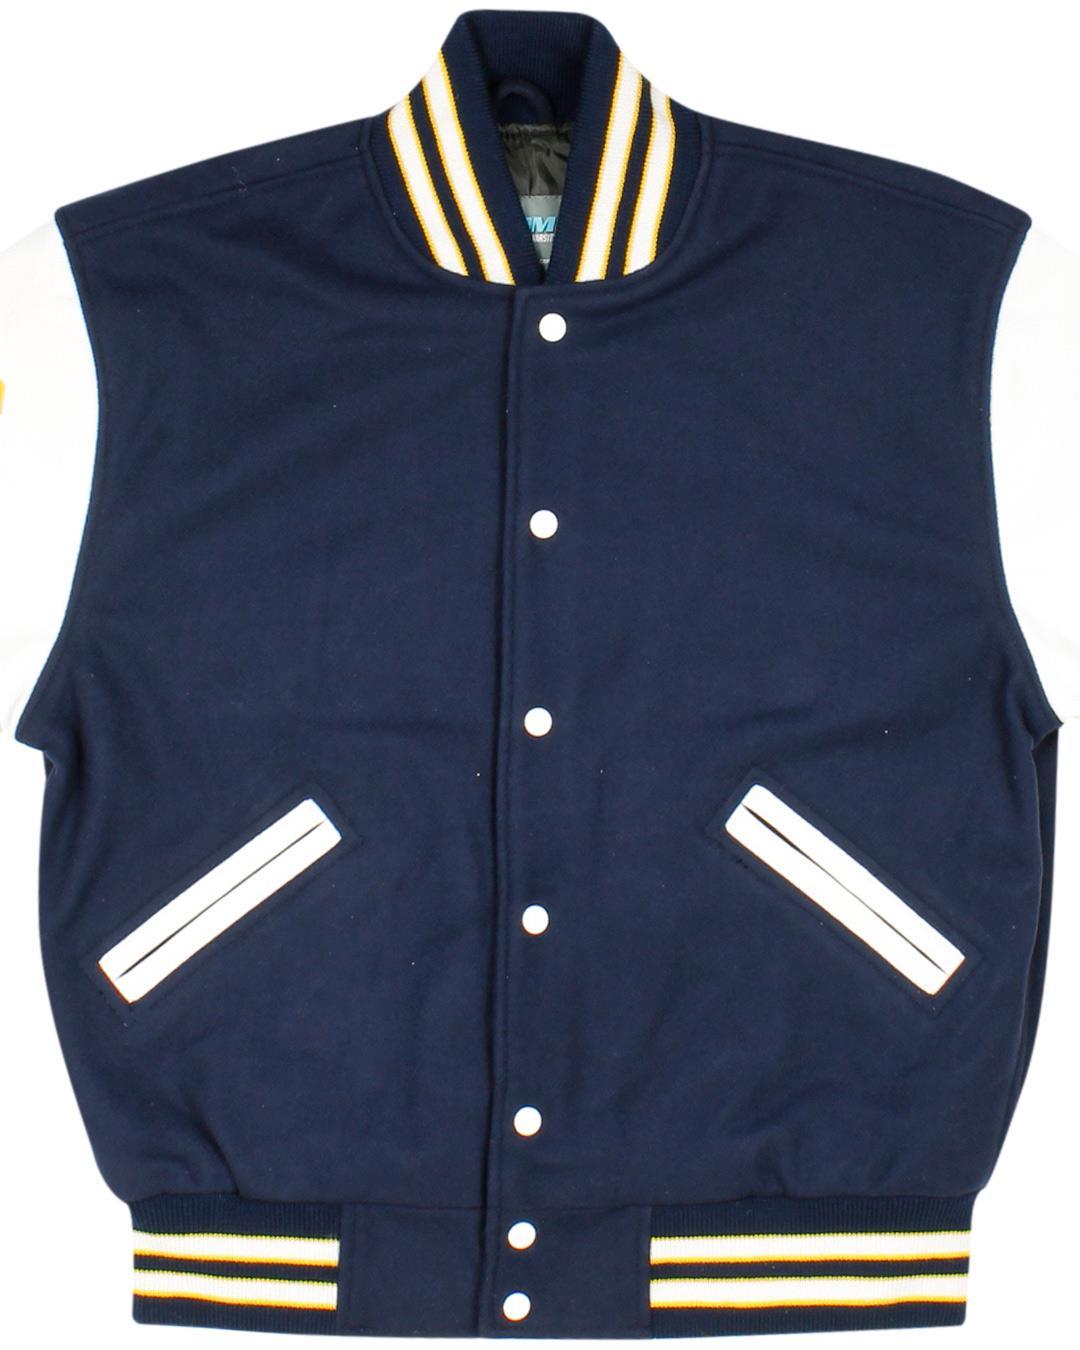 Foothill High School Letterman Jacket, Henderson NV - Front